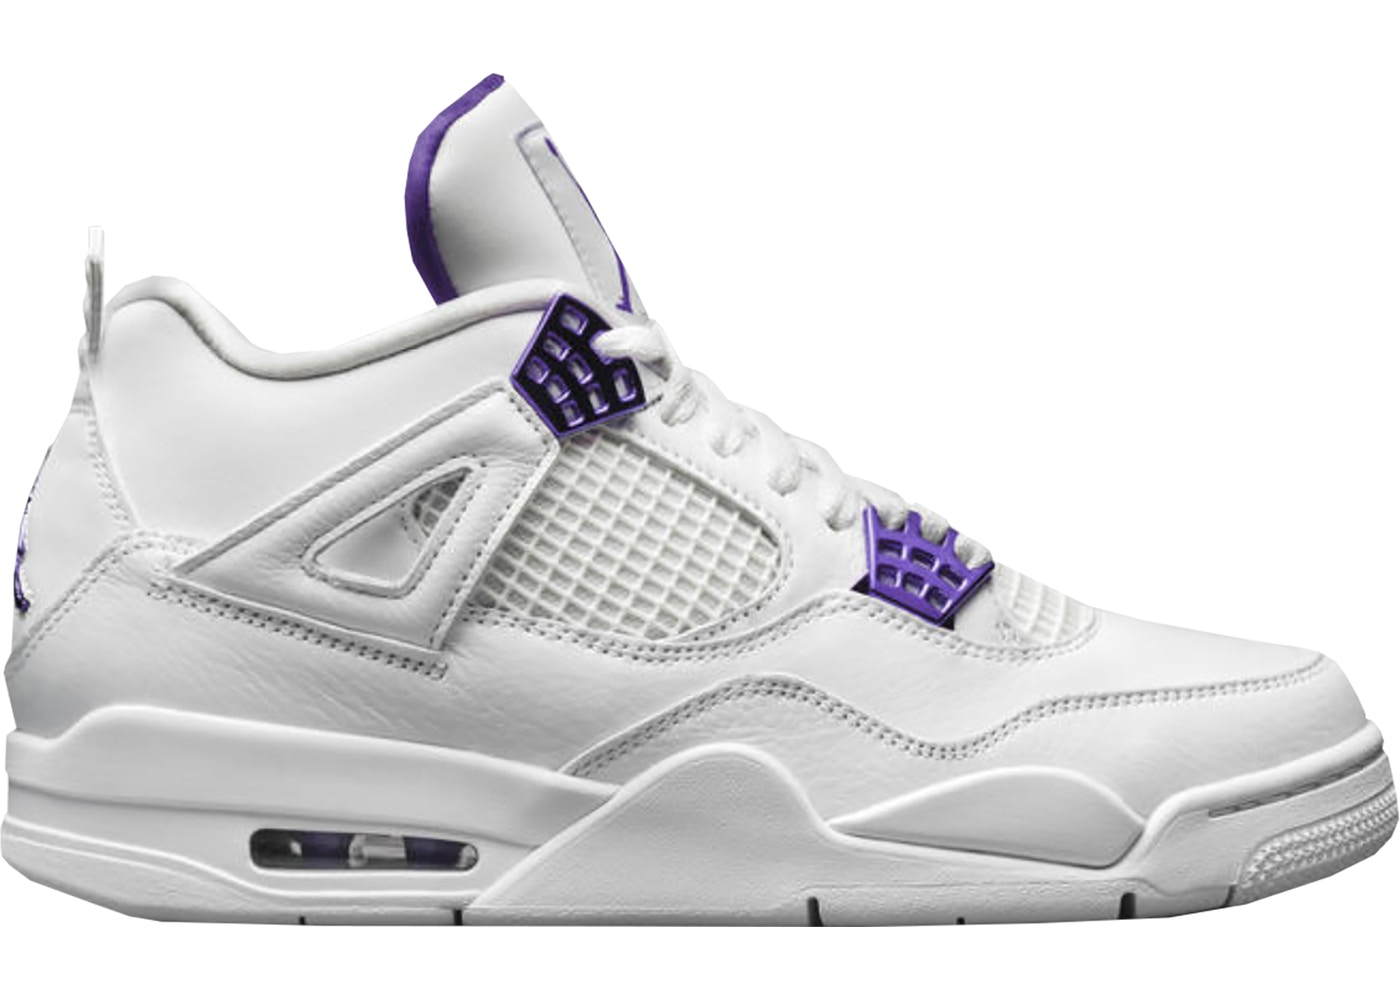 air jordan 1 court purple 2020 stockx